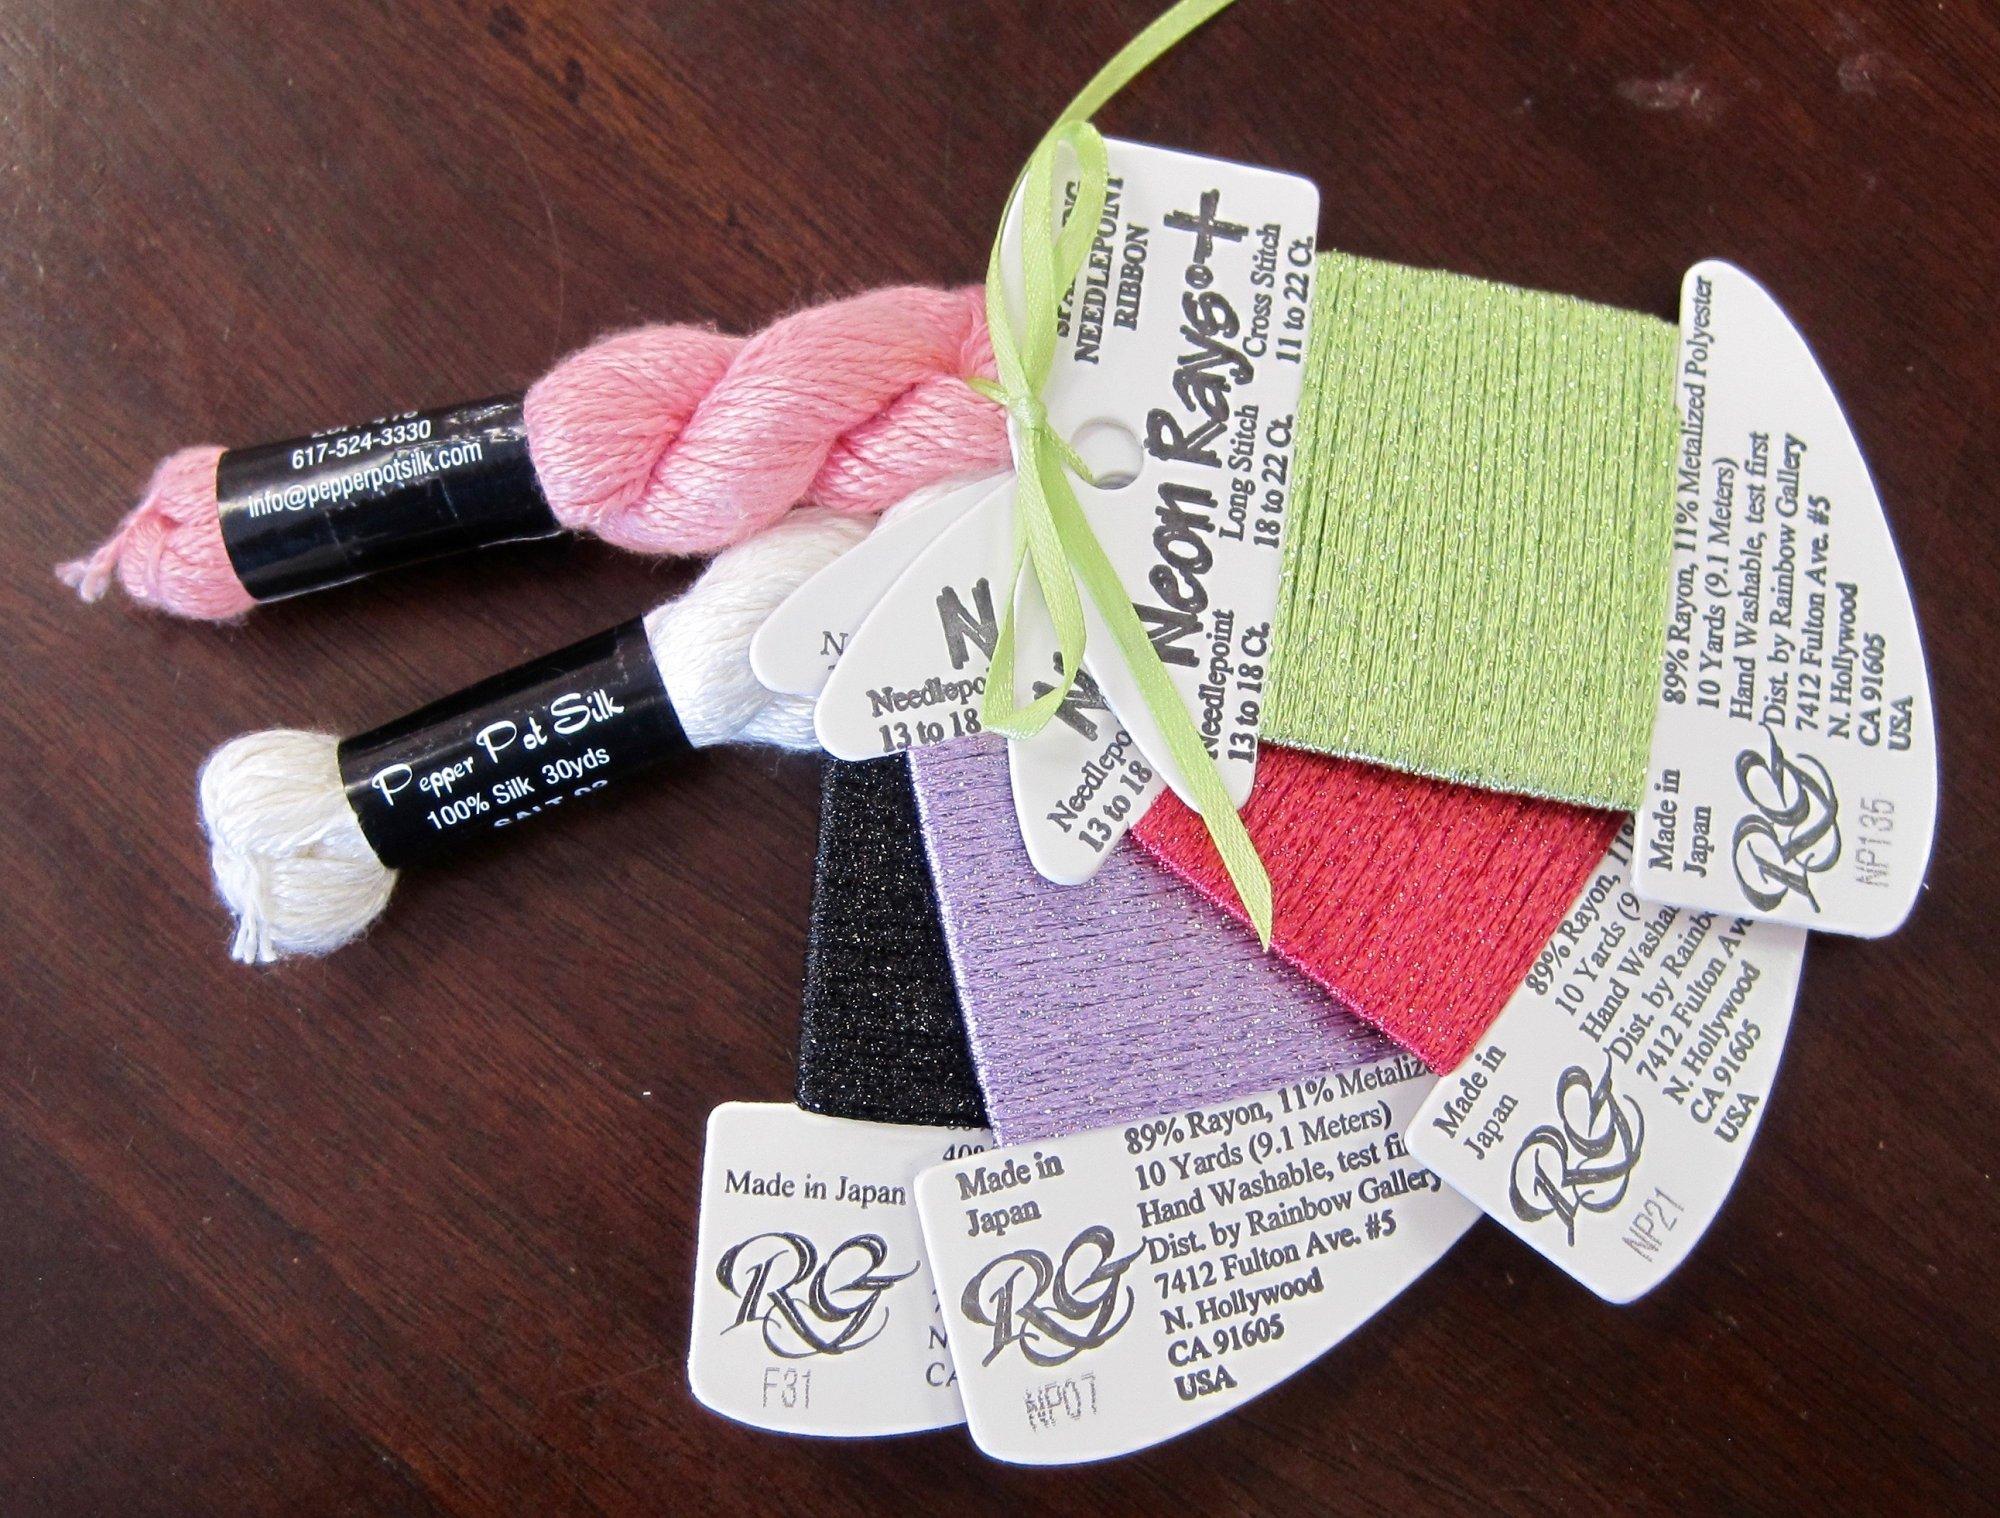 Pink Skirt Sock Monkey Thread Pak